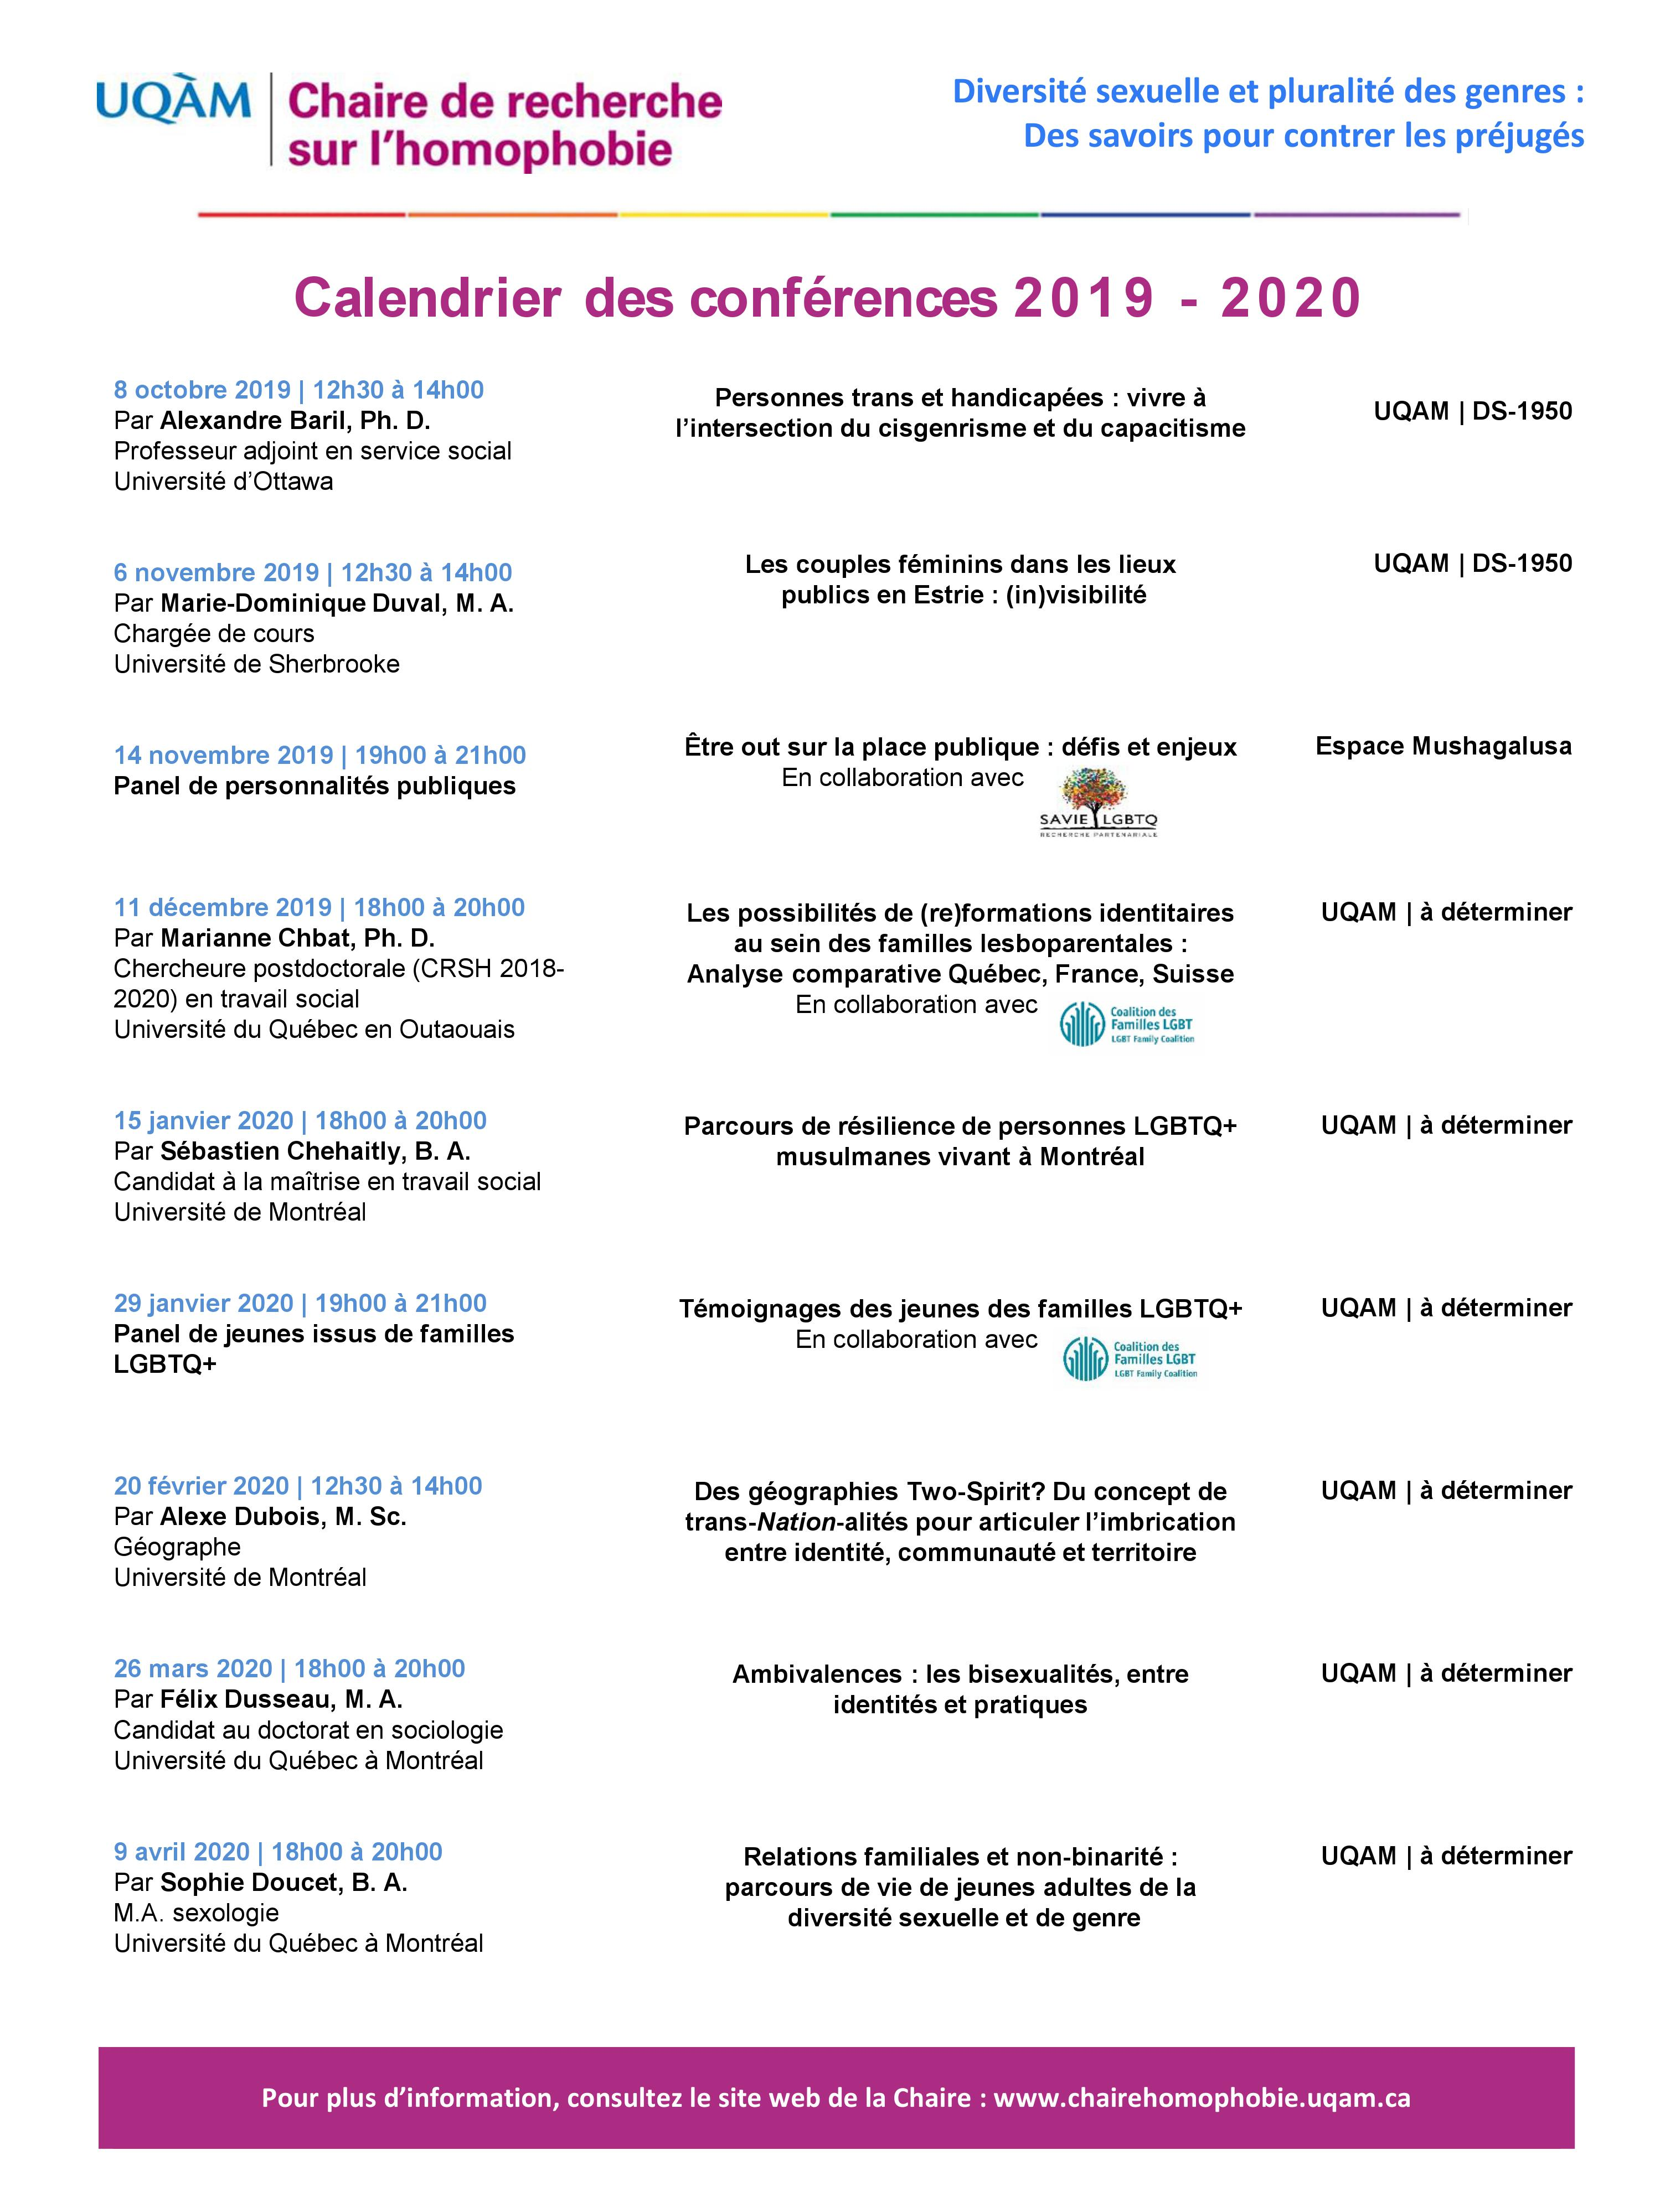 Affiche du calendrier